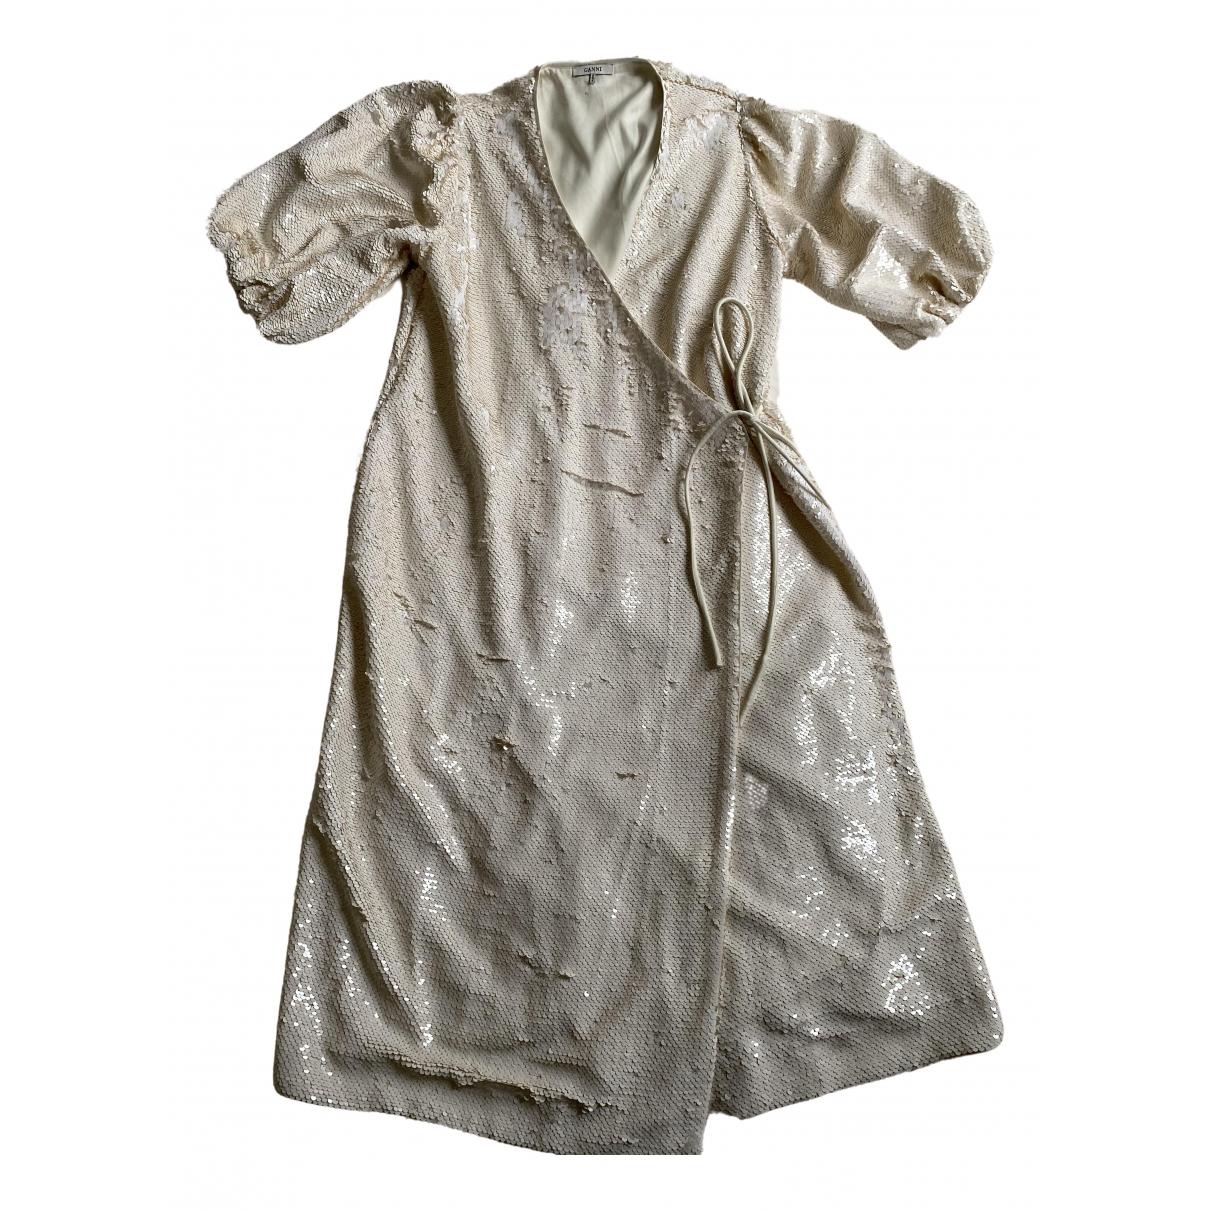 Ganni - Robe Spring Summer 2019 pour femme - blanc